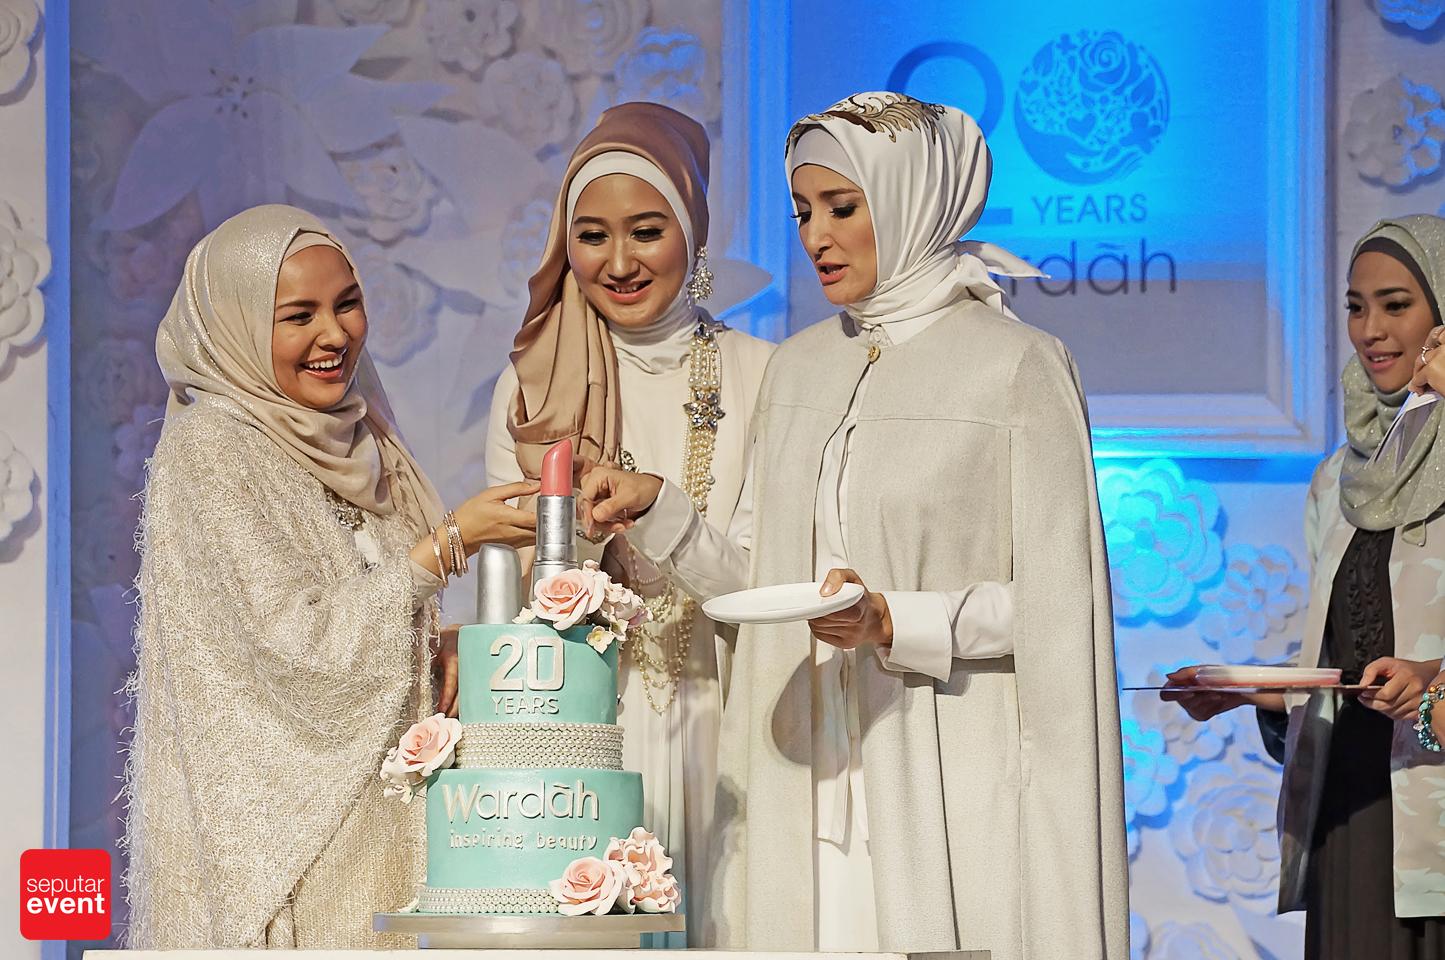 The 20th Anniversary of Wardah (65).JPG